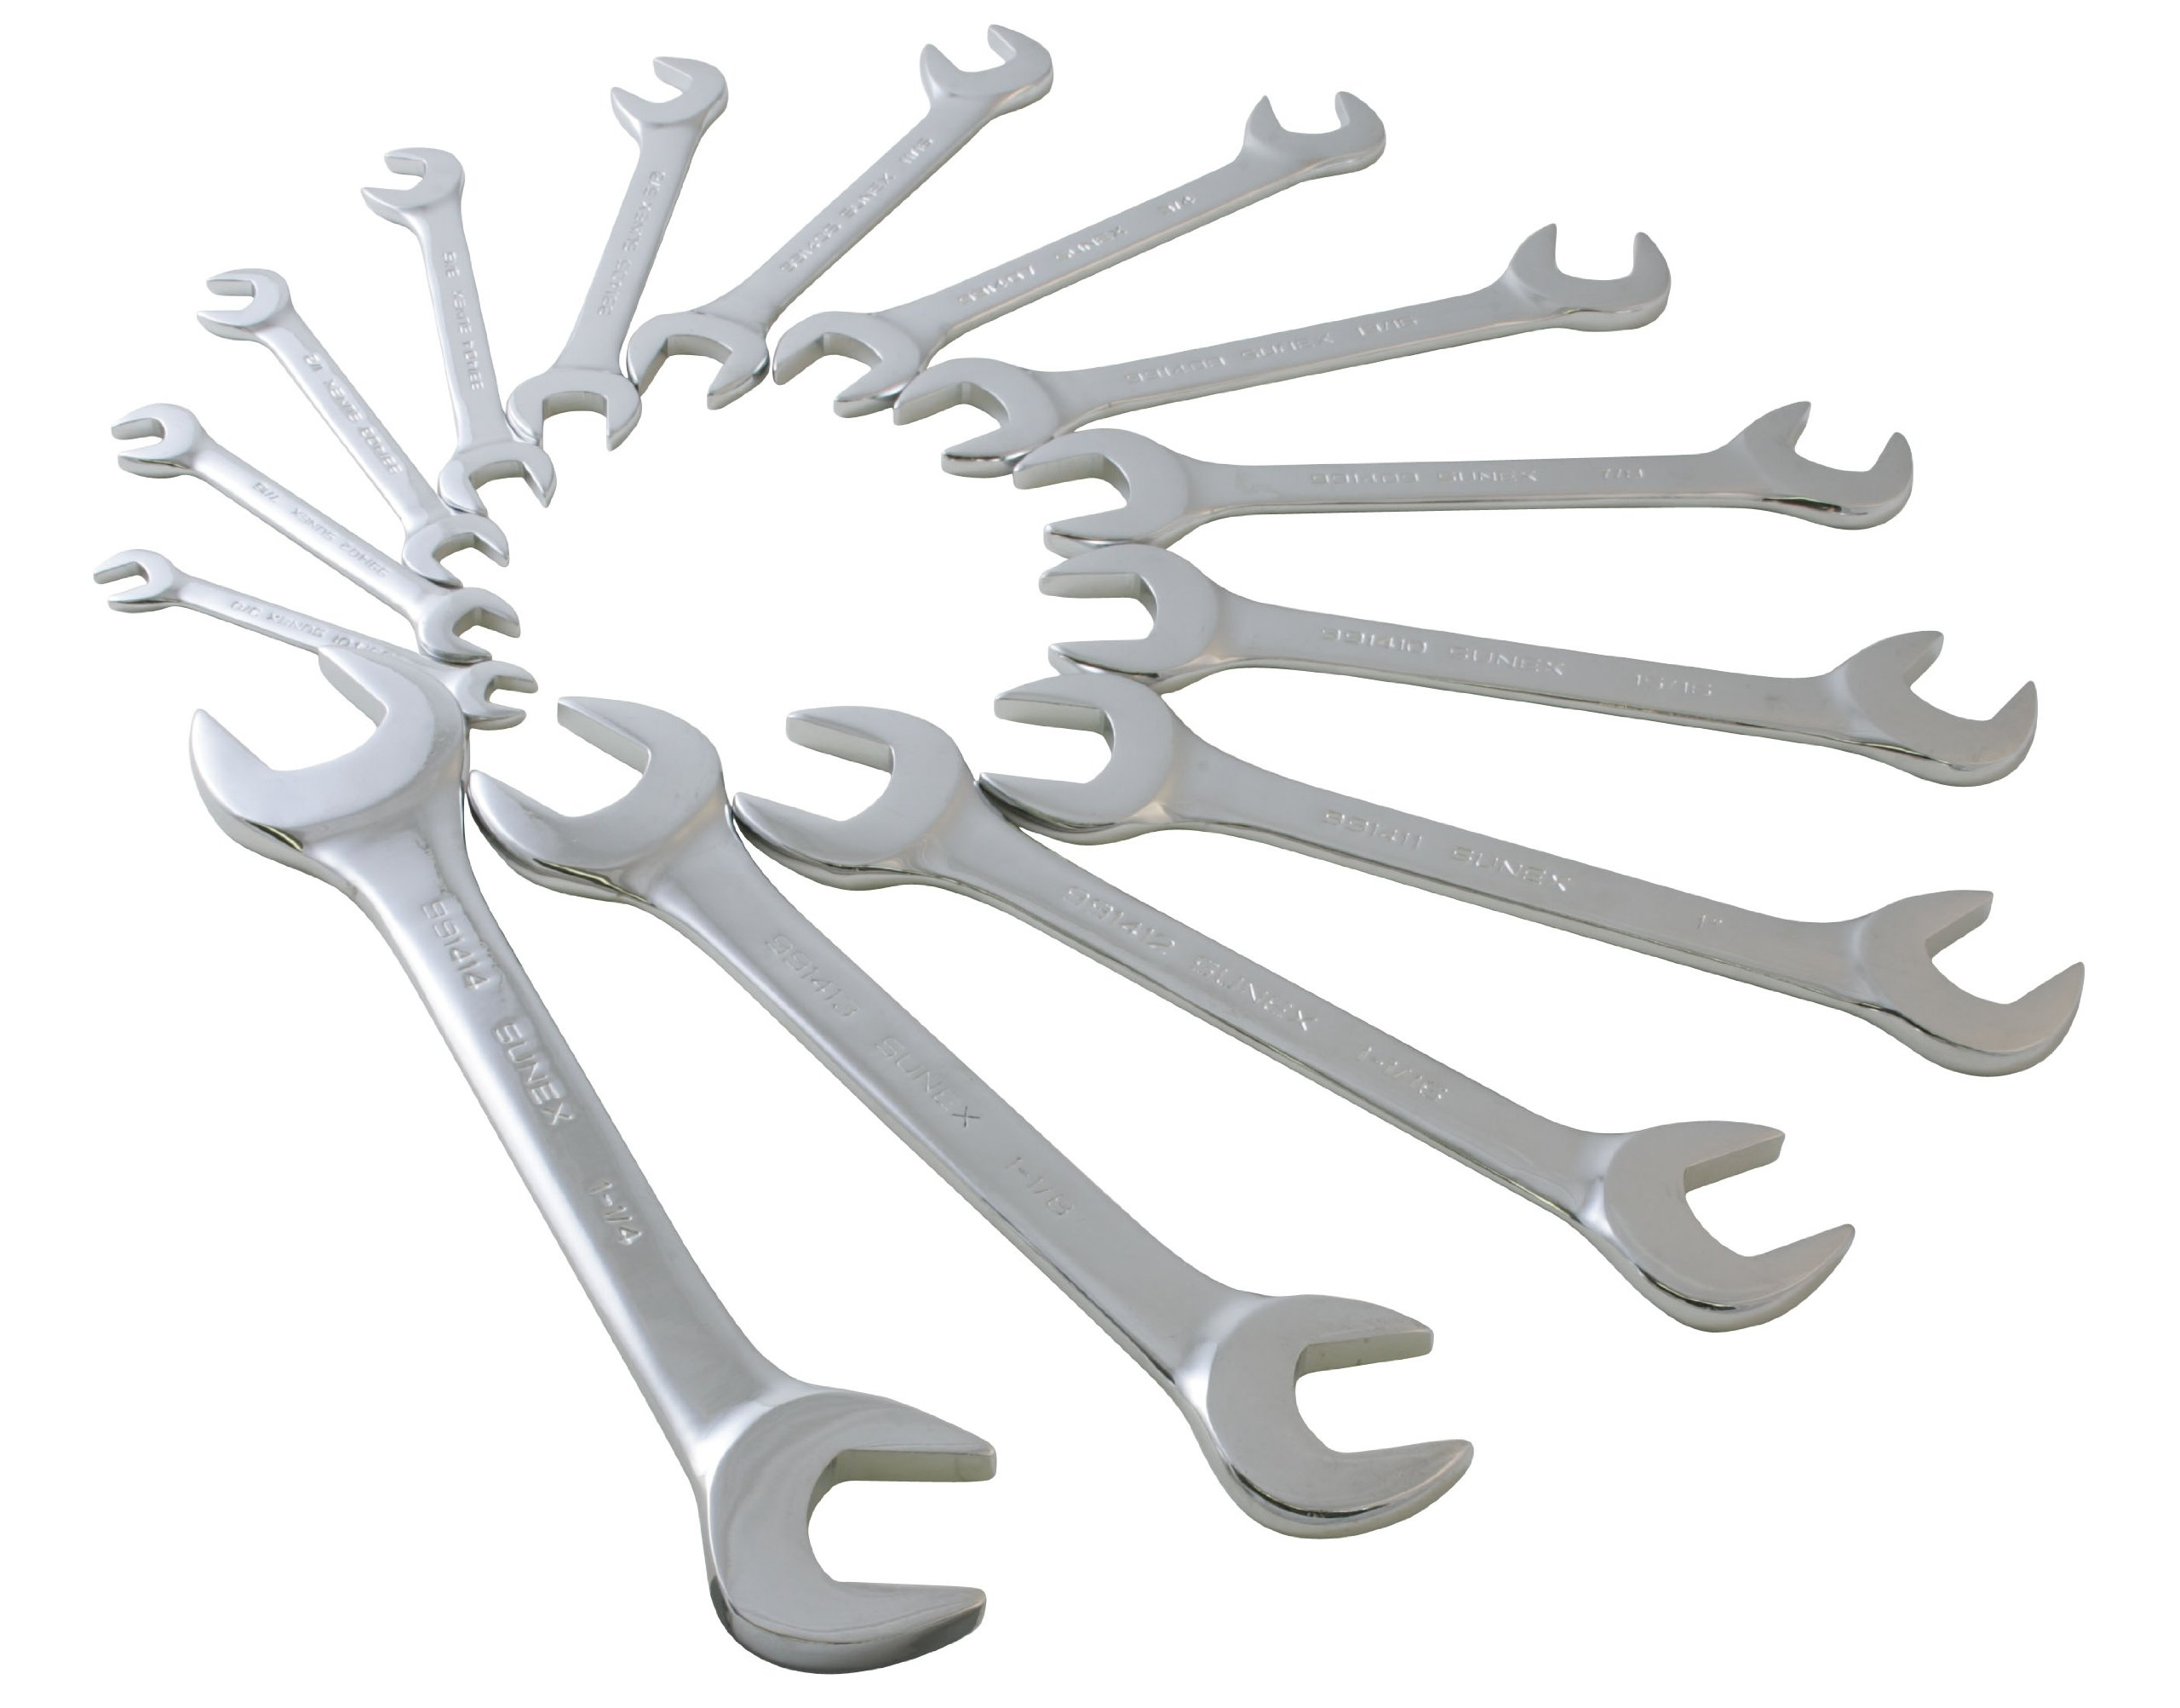 Sunex 9914 SAE Angled Wrench Set, 3/8-Inch - 1-1/4-Inch, 14-Piece